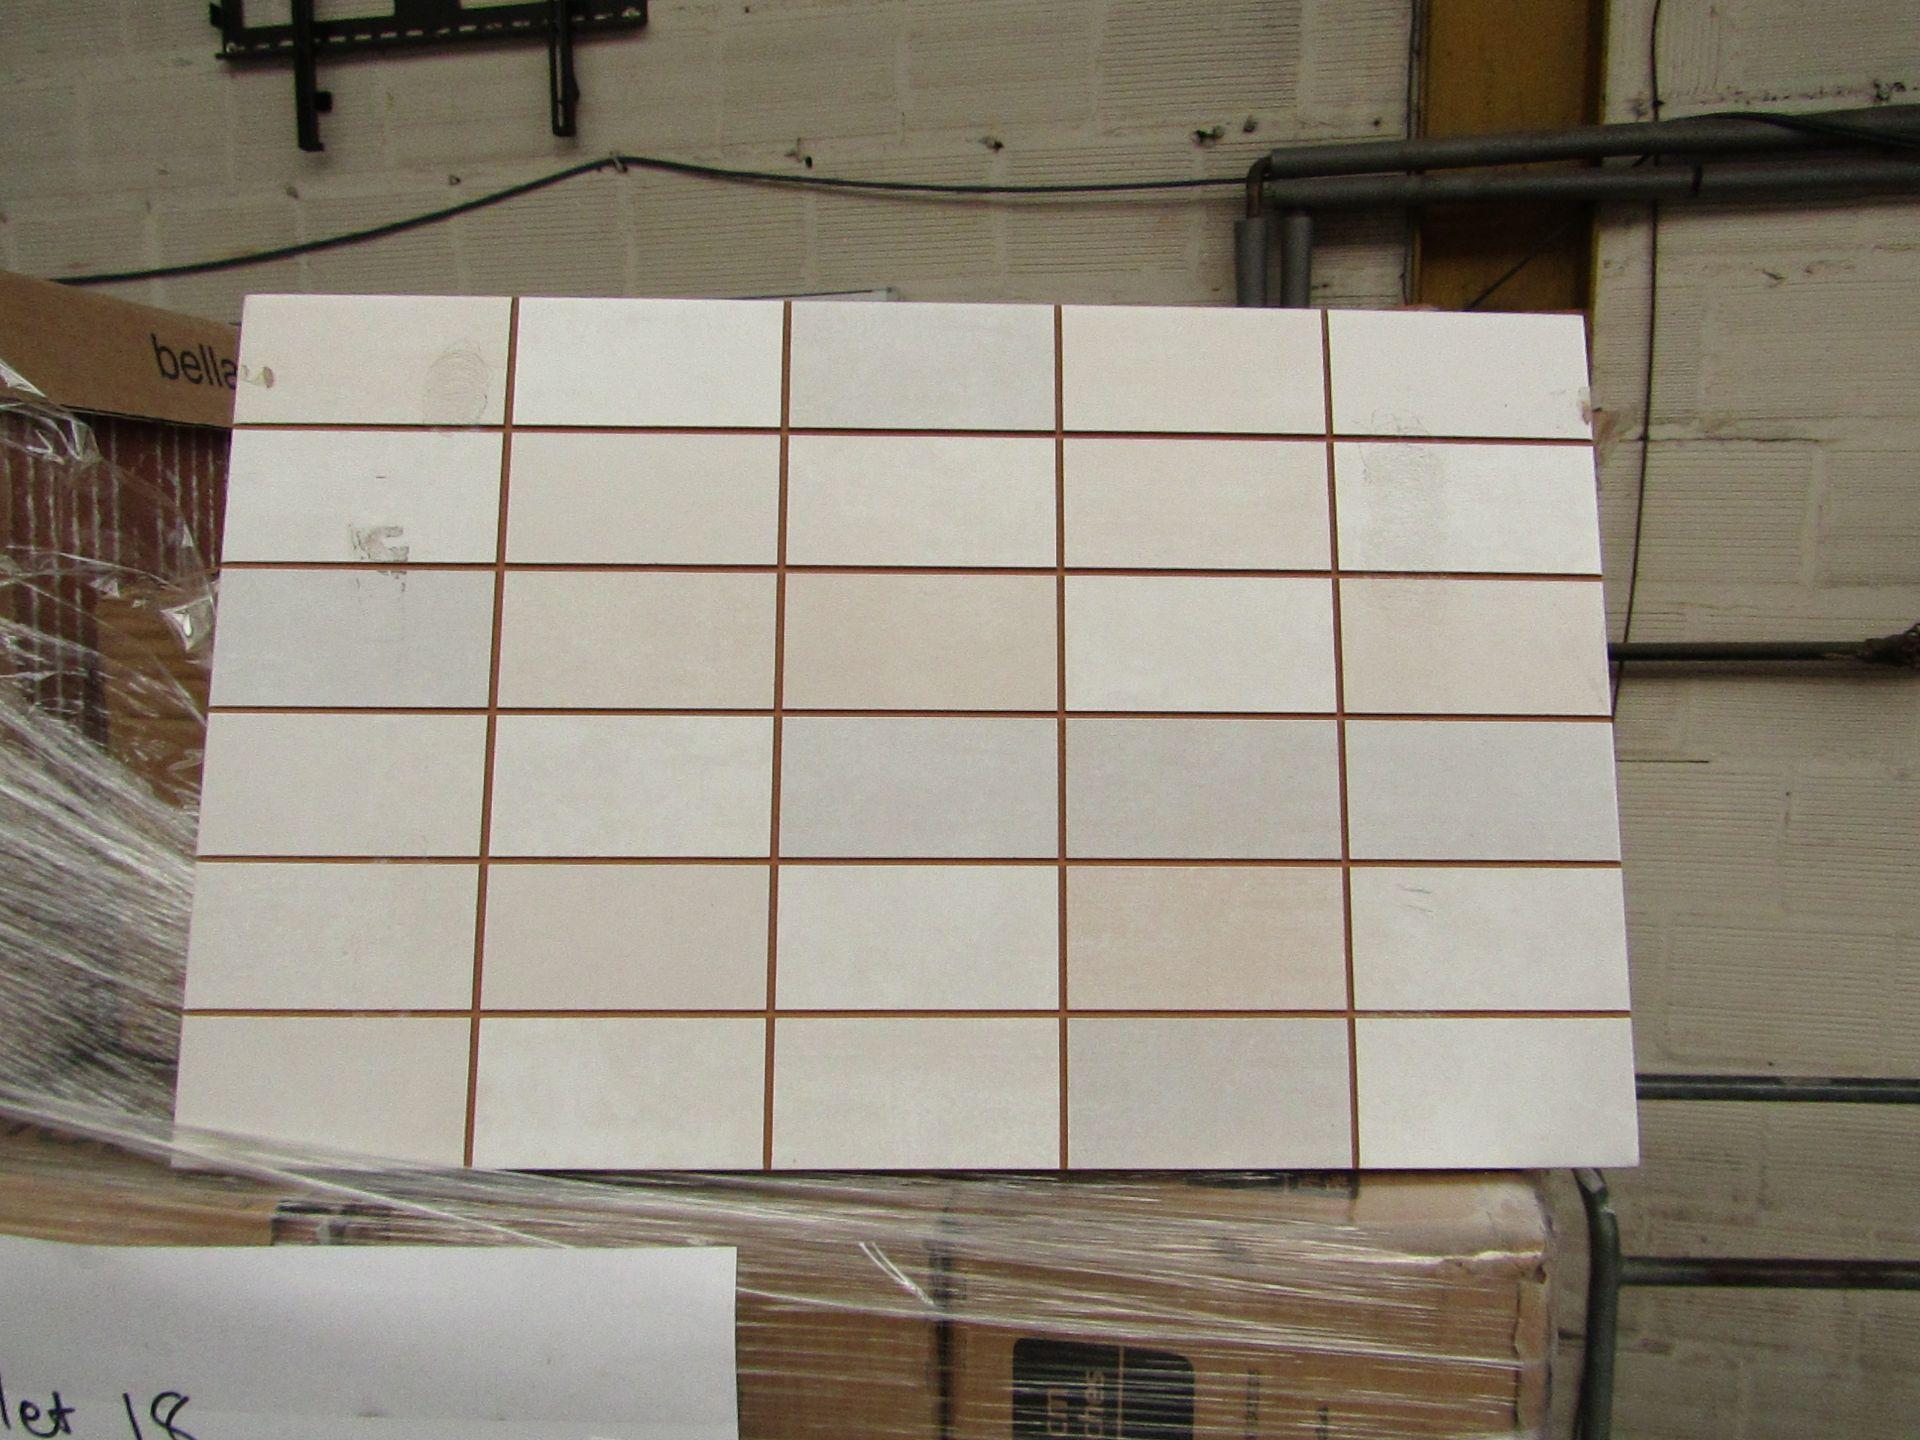 Lotto 390 - 10x packs of 17 Bella Vista Freya Cream mosaic tiles 400x250, RRP £16.66 giving a total lot RRP of